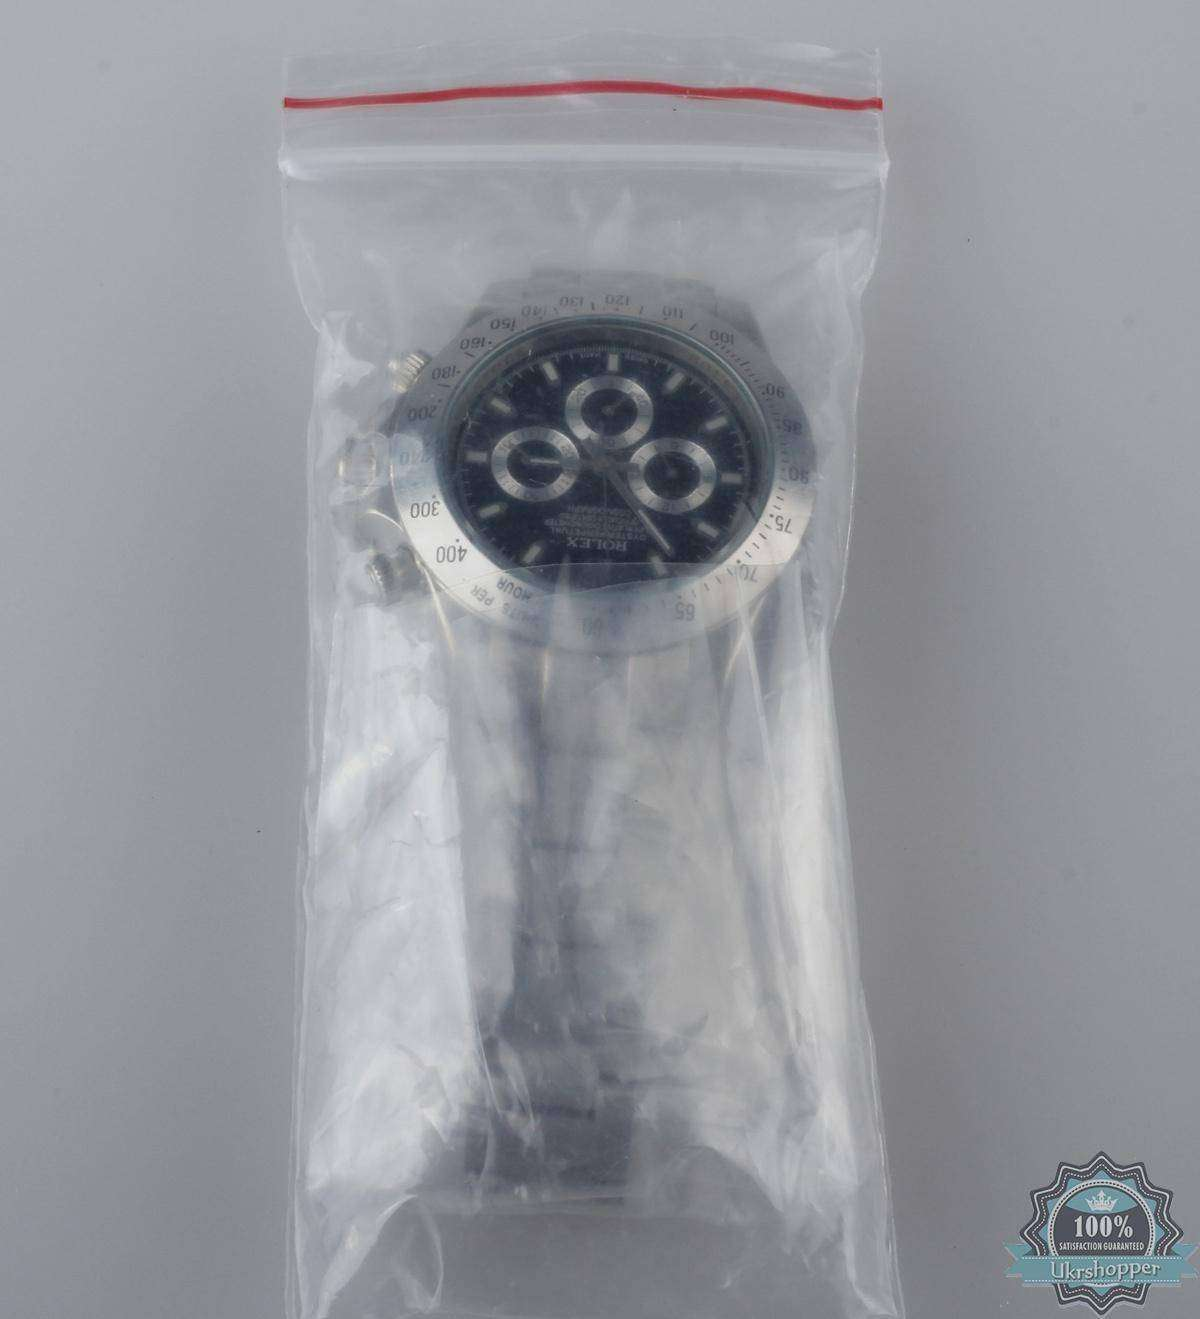 Aliexpress: Недорогая реплика Rolex